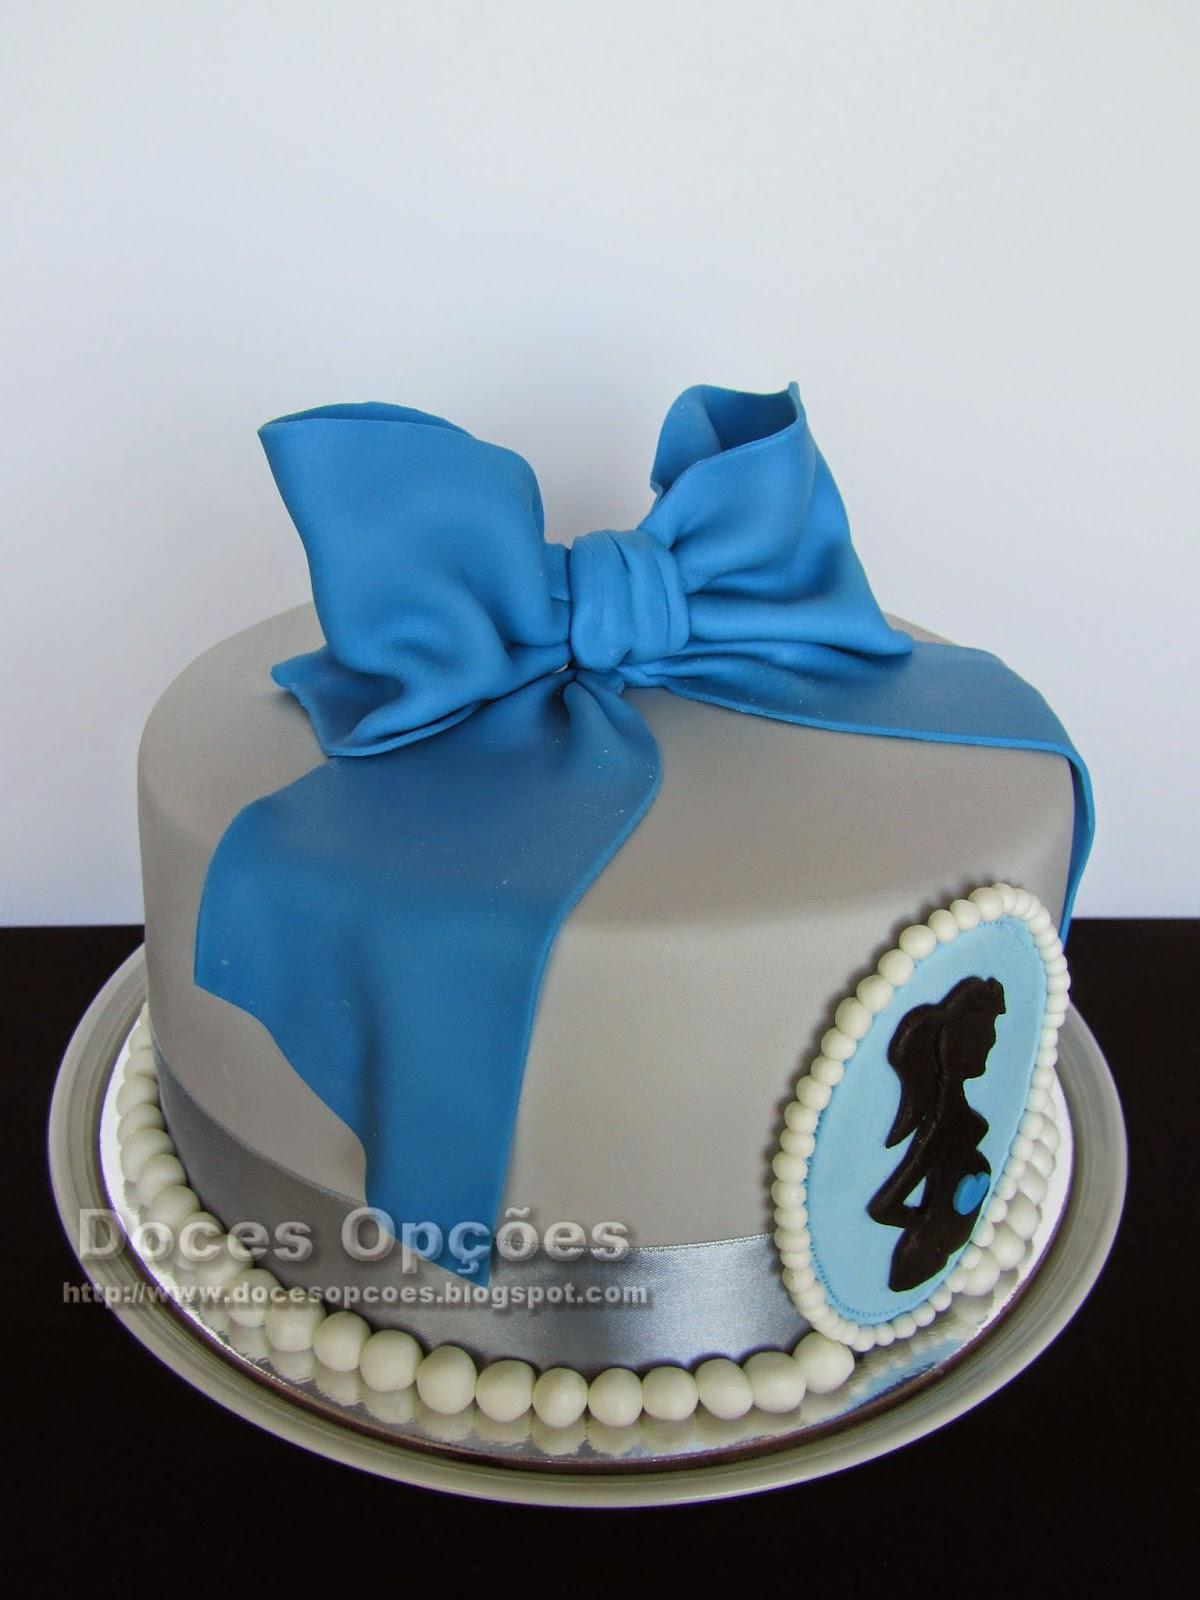 bolo festa gravidez bragança